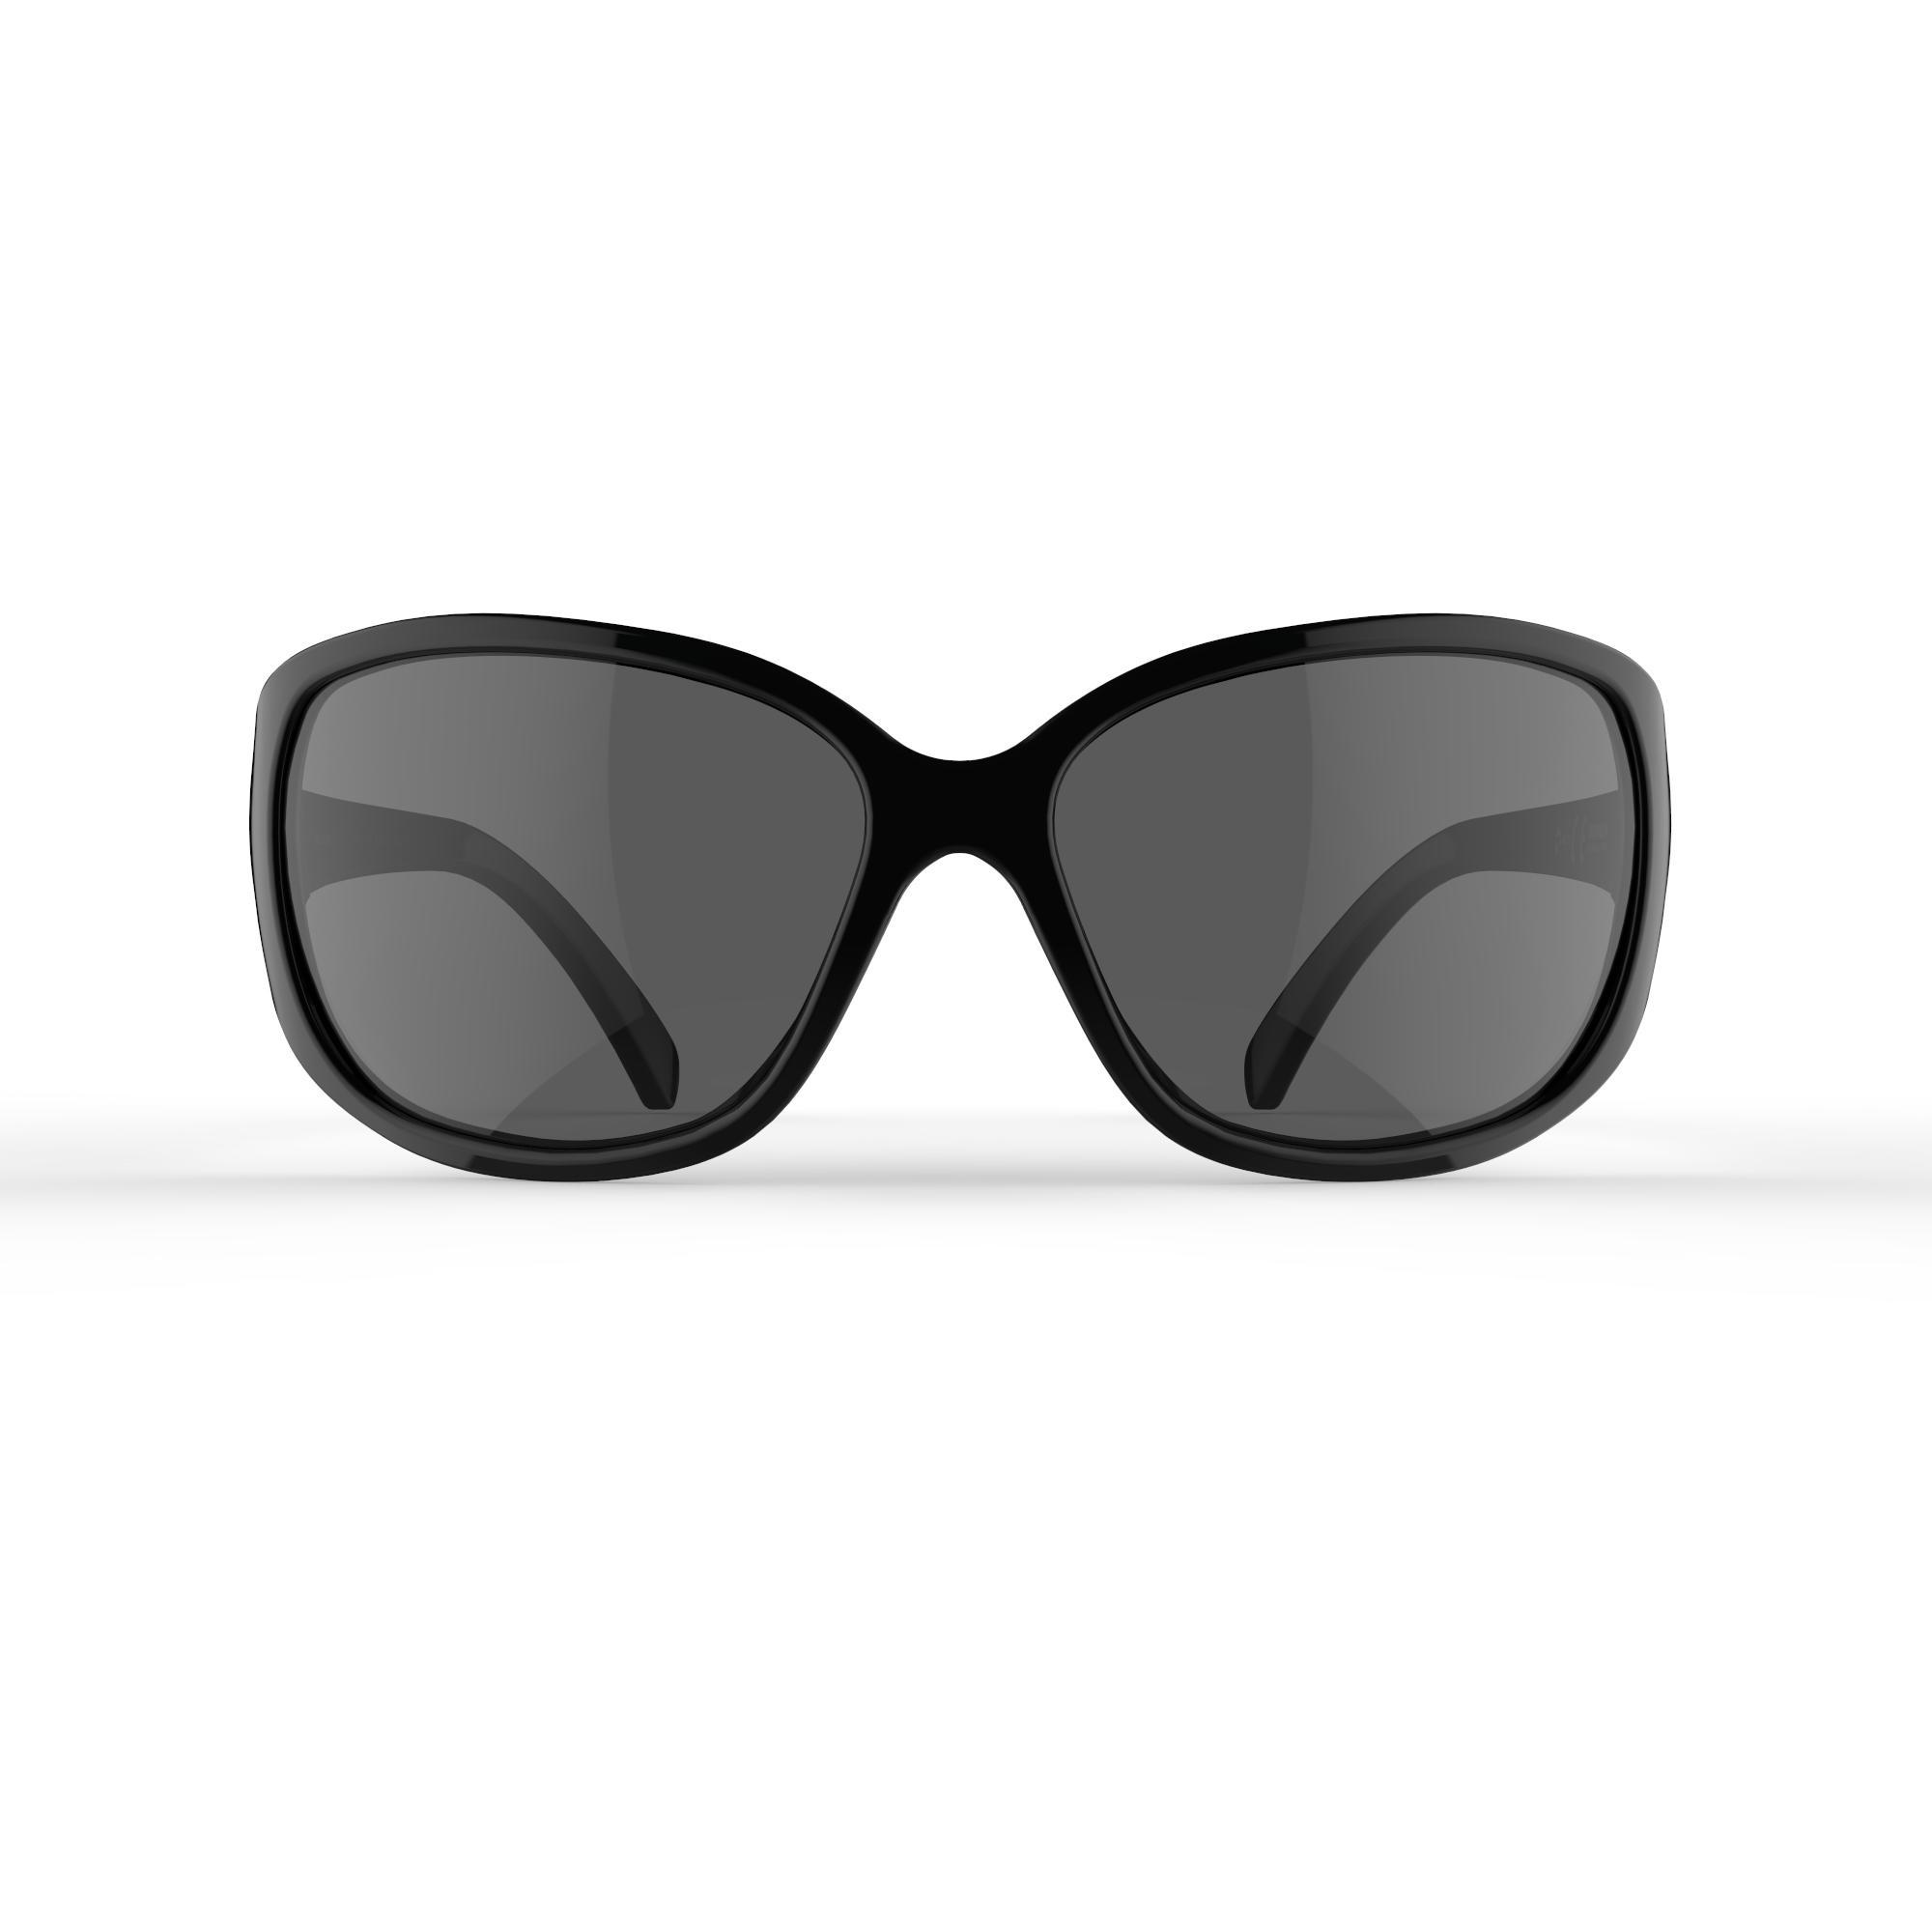 Women's Hiking Sunglasses MH530W Category 3 (Polarised) - Black